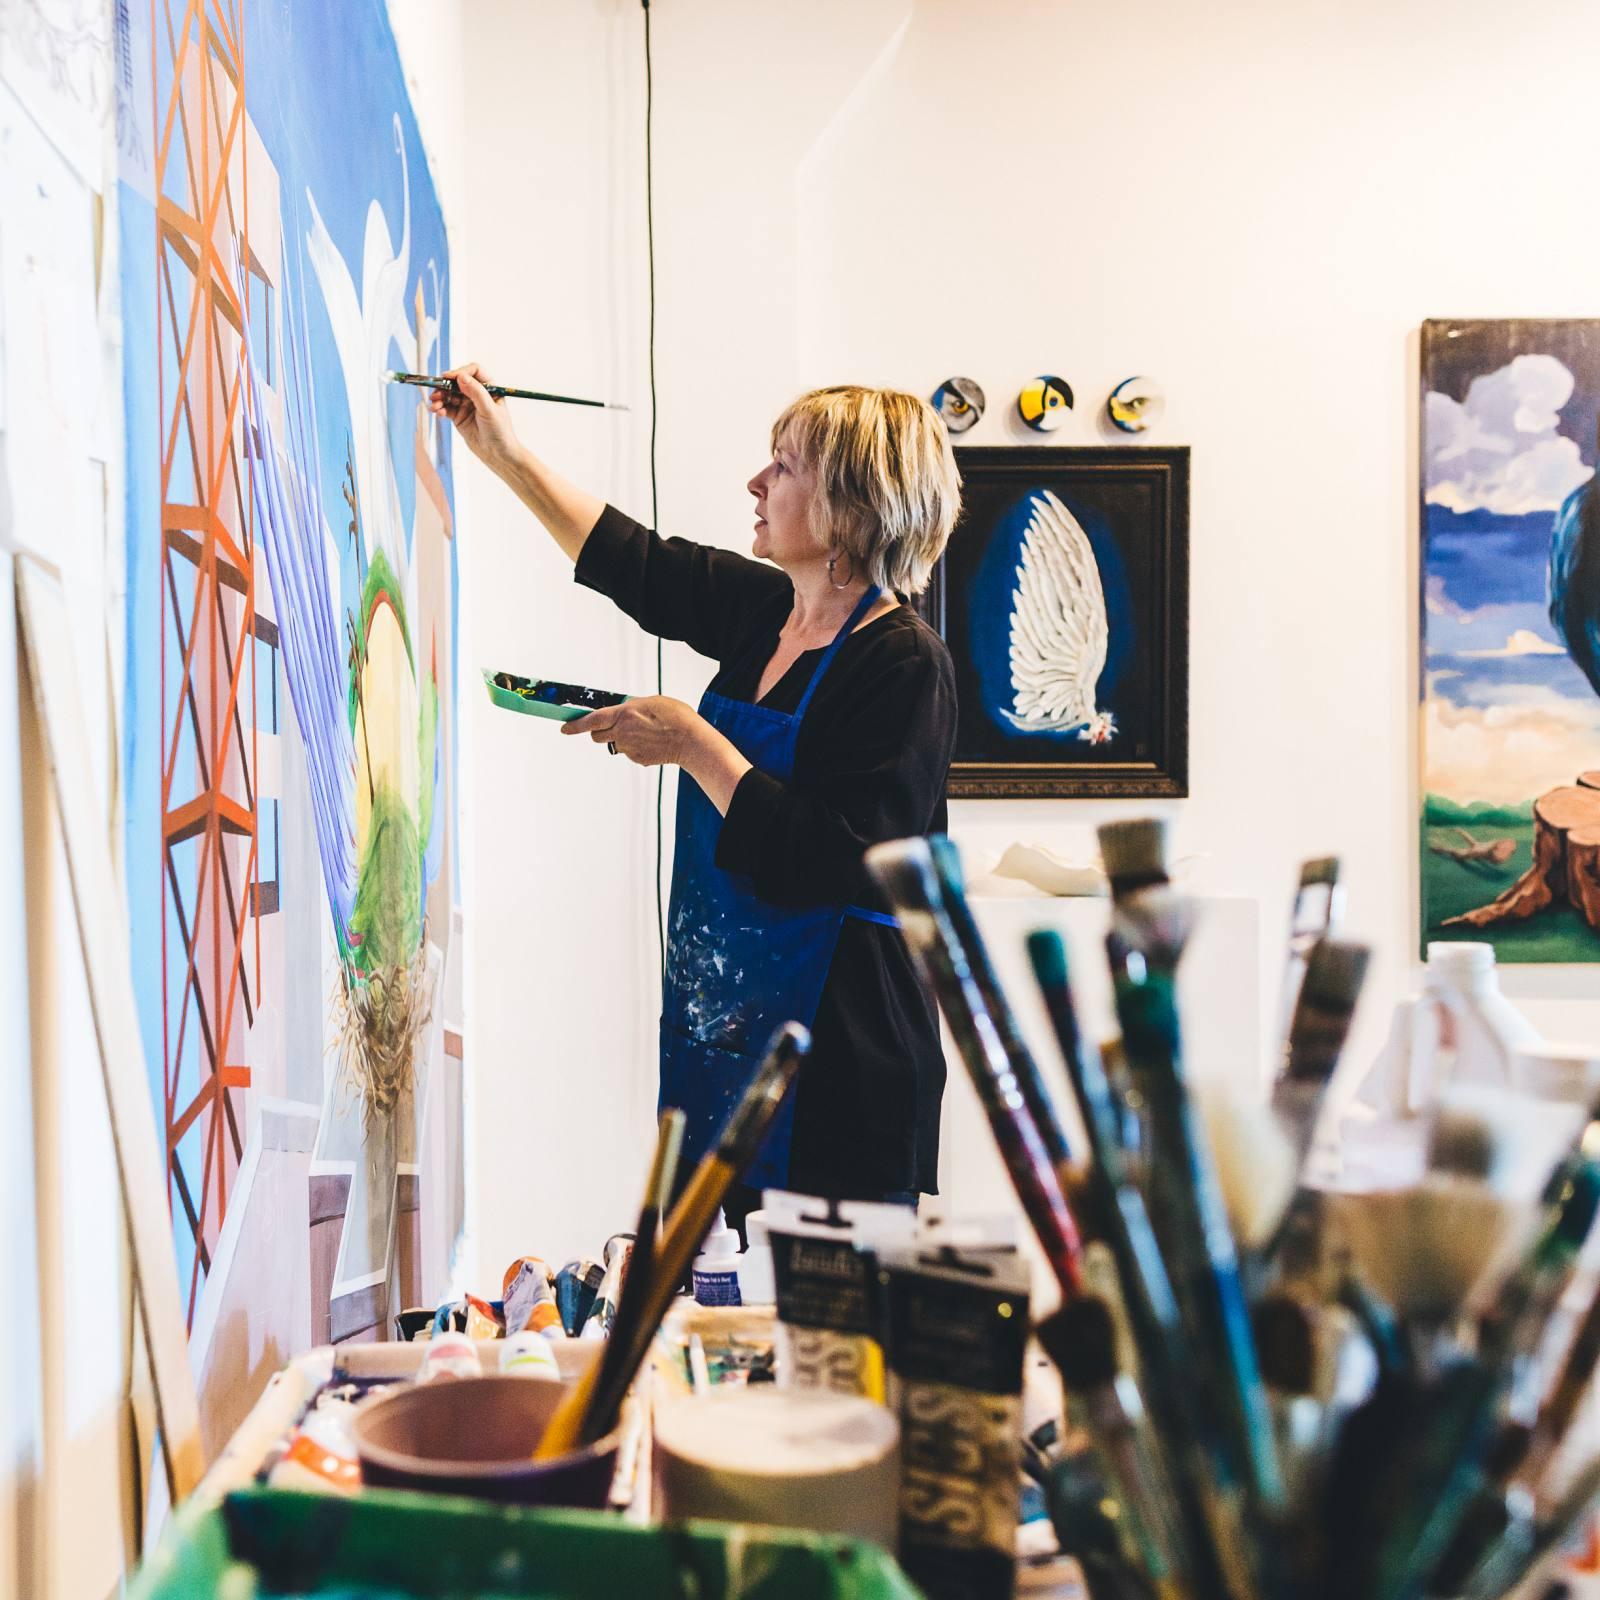 Liliana finishing part of an installation piece in her Boston studio.